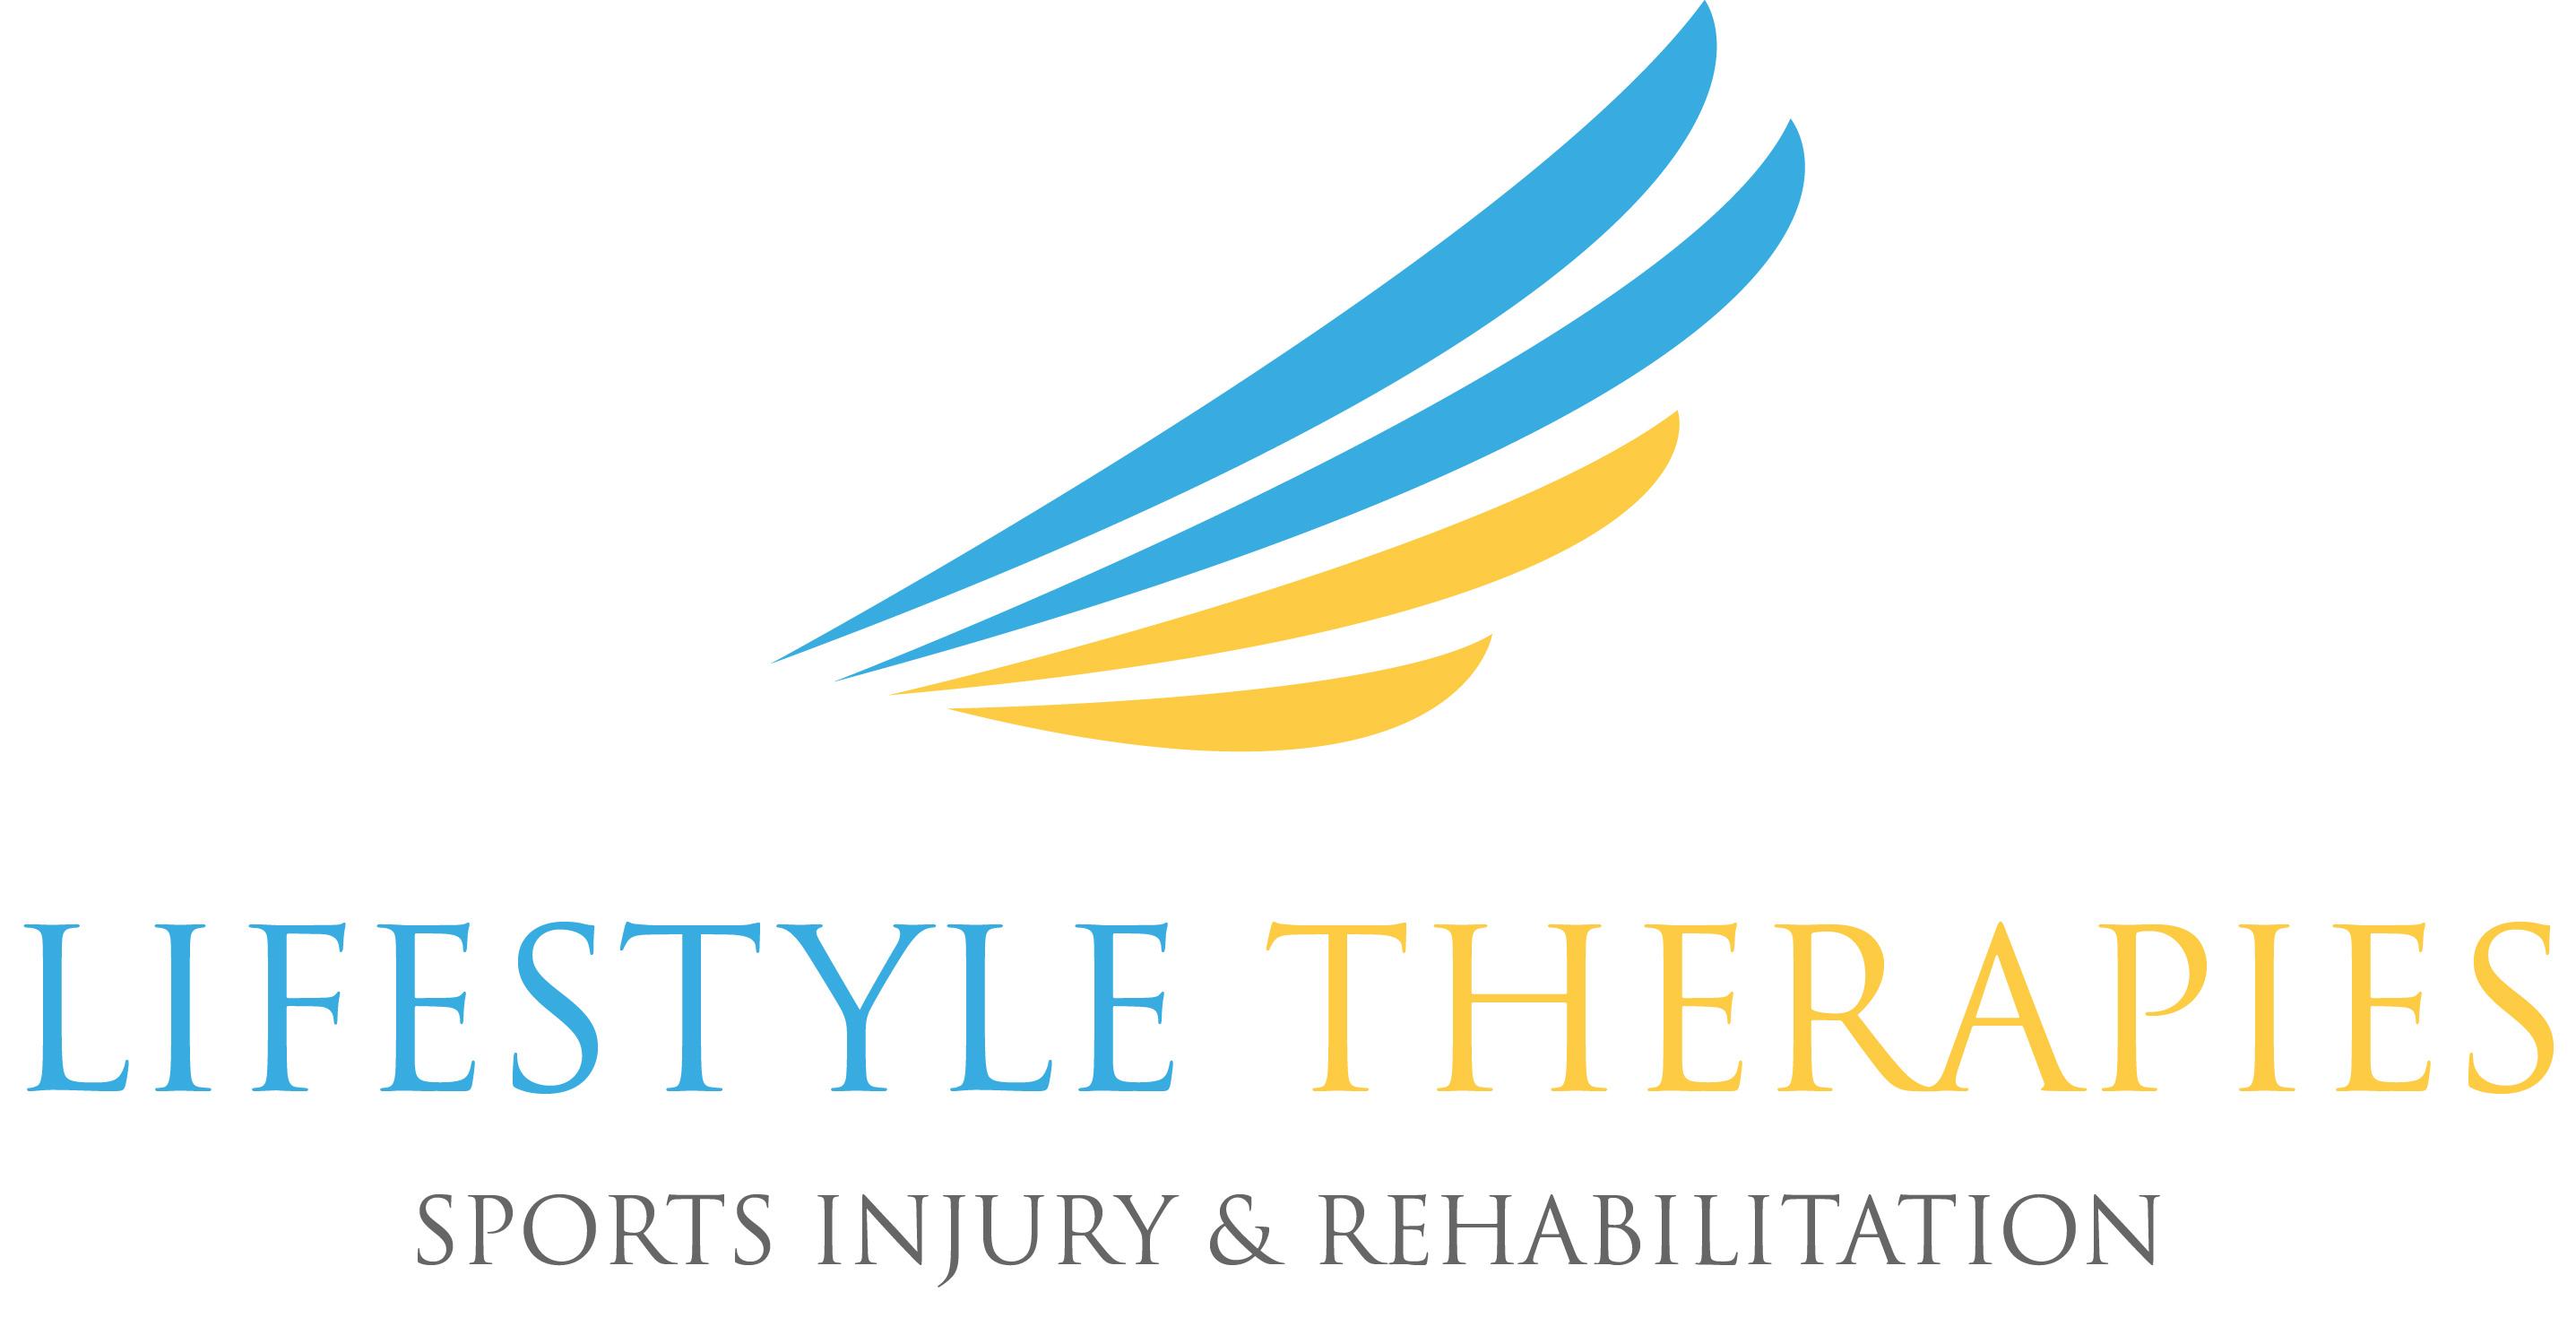 Lifestyle Therapies